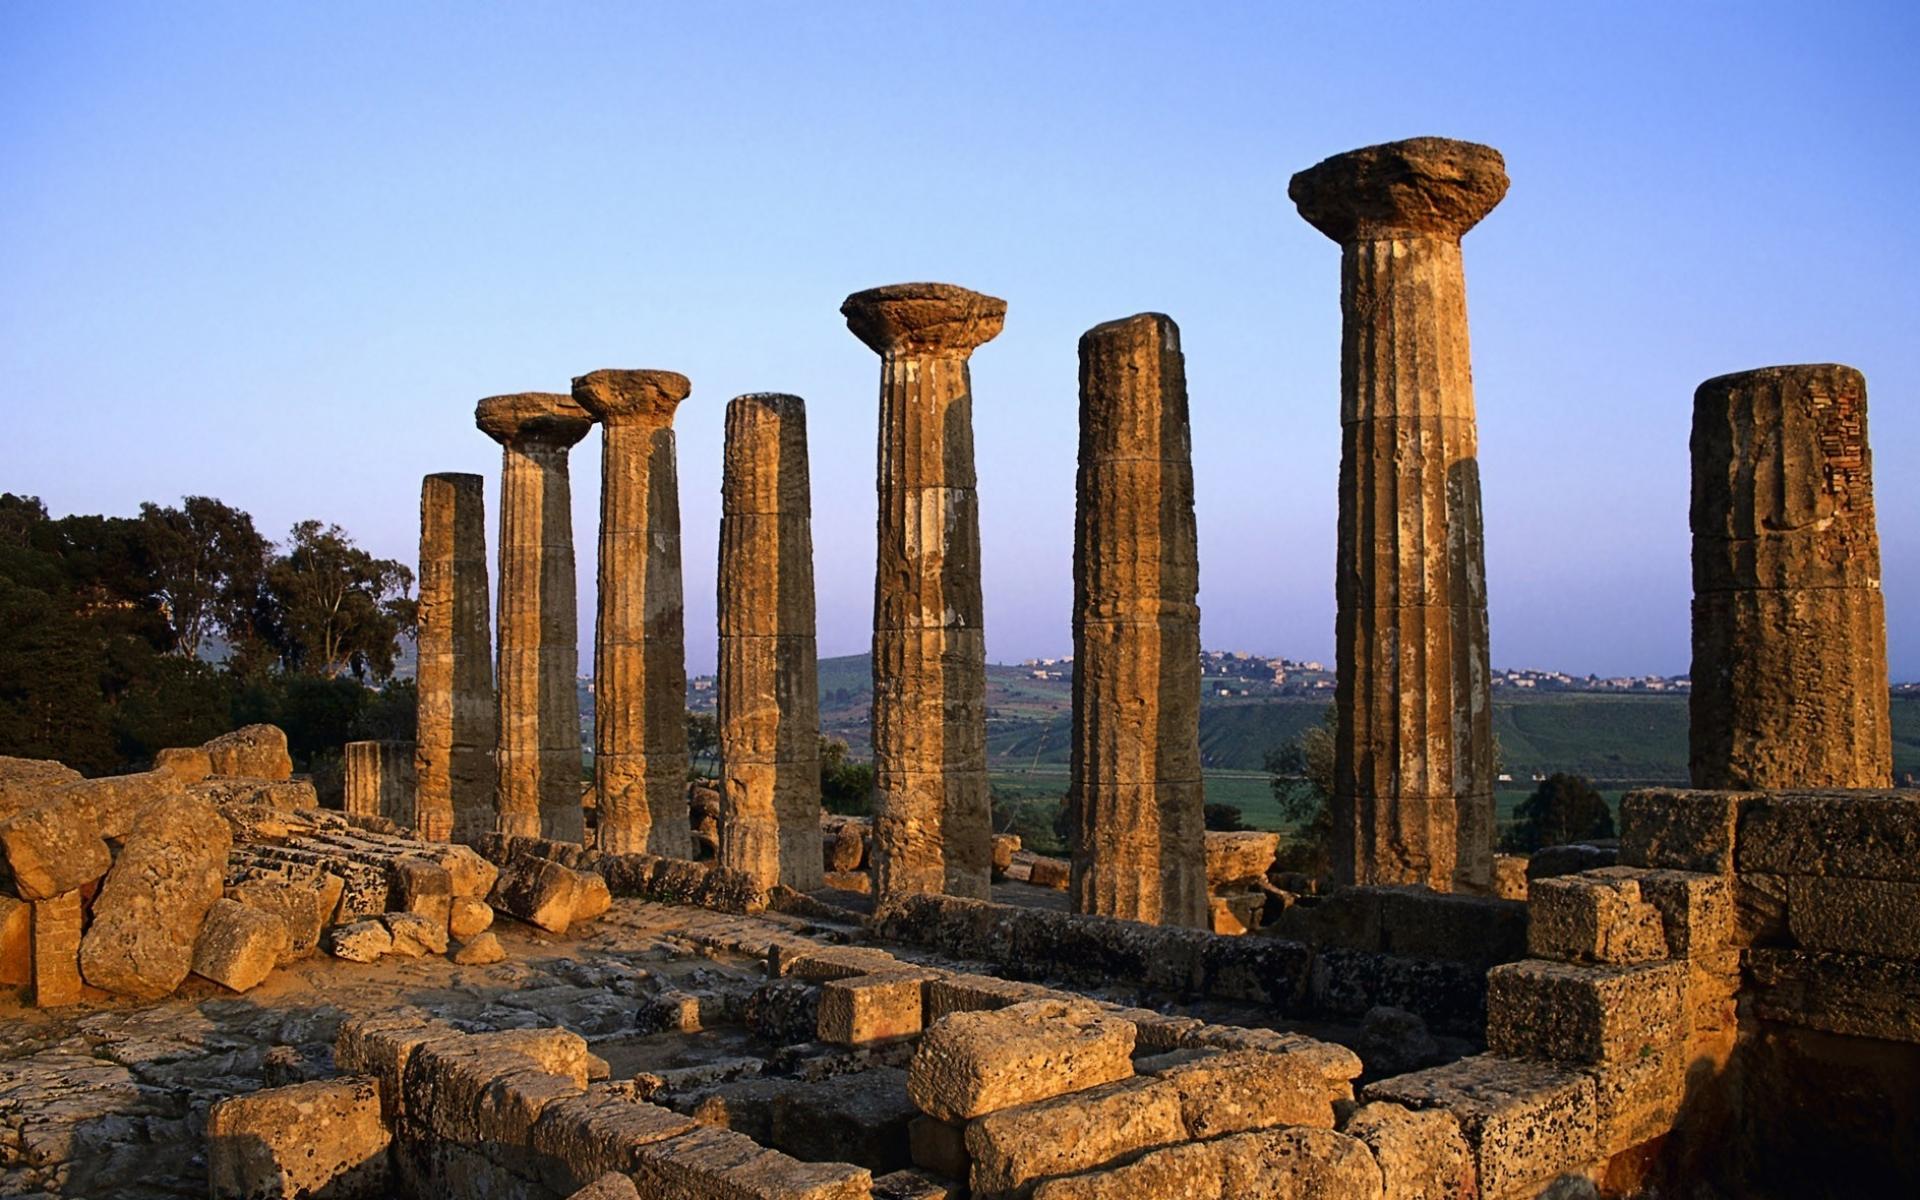 фотообои колонны: